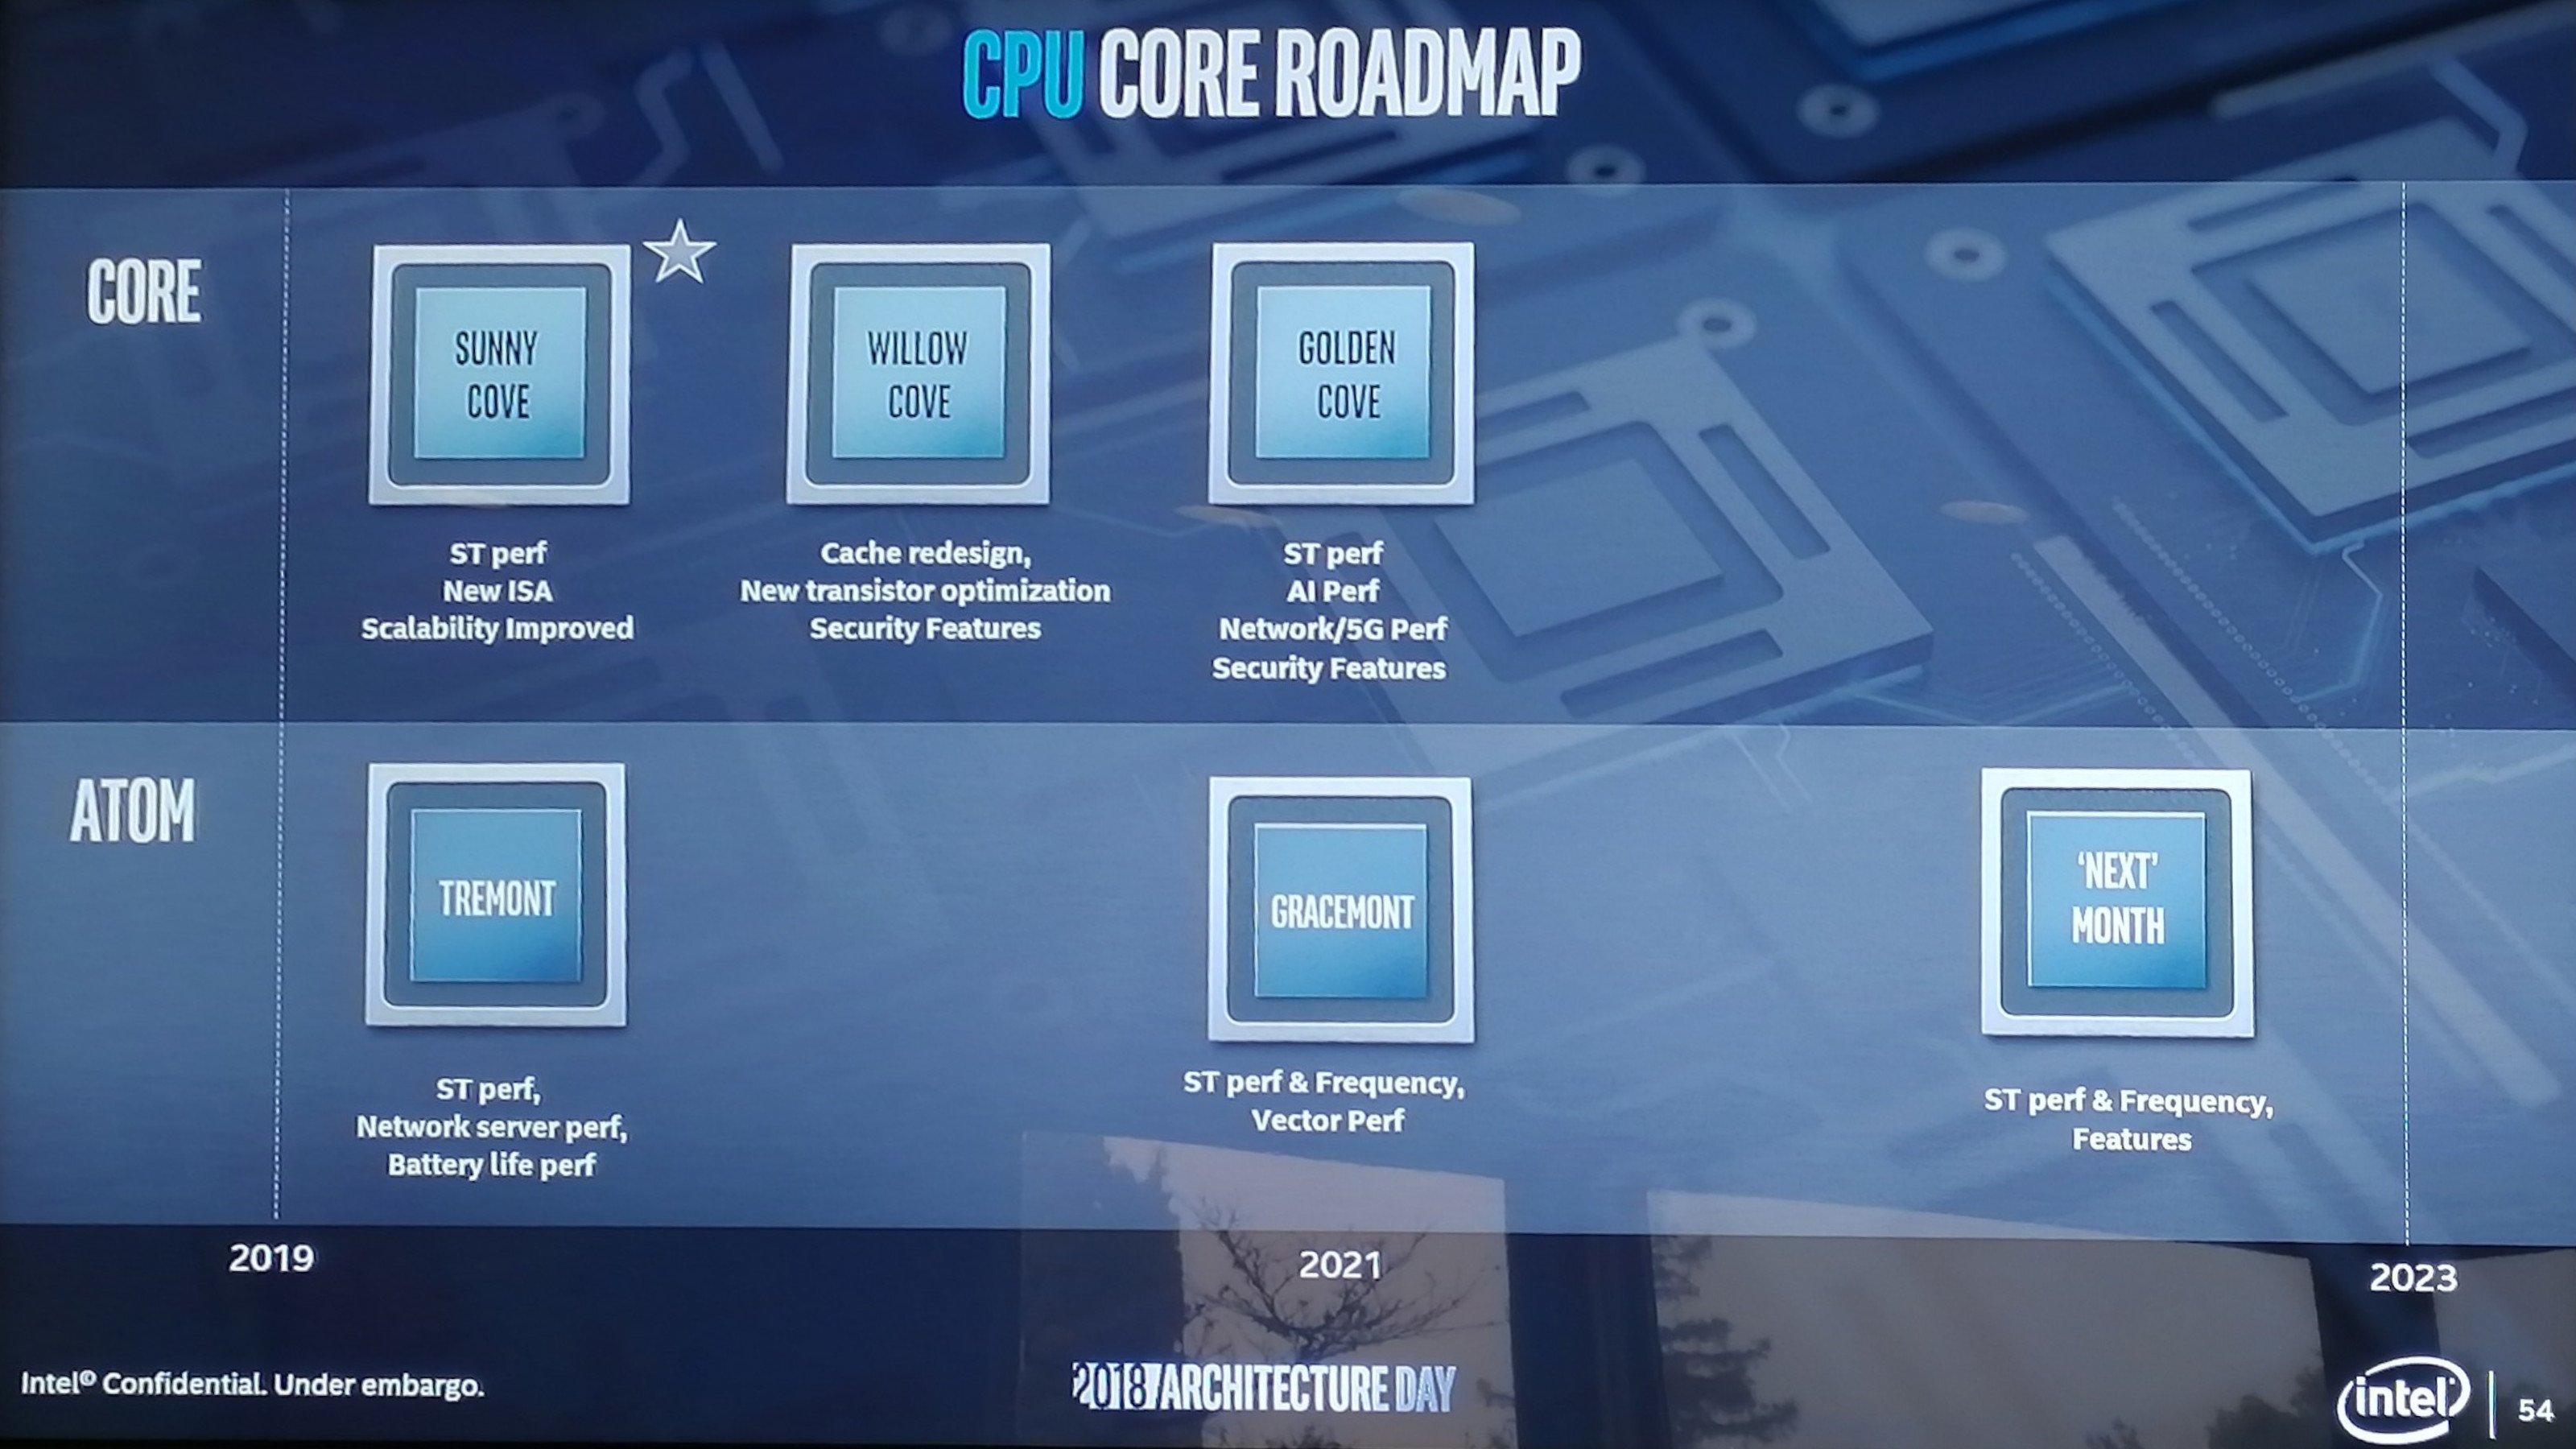 Intel Sunny Cove, Willow Cove i Golden Cove roadmap